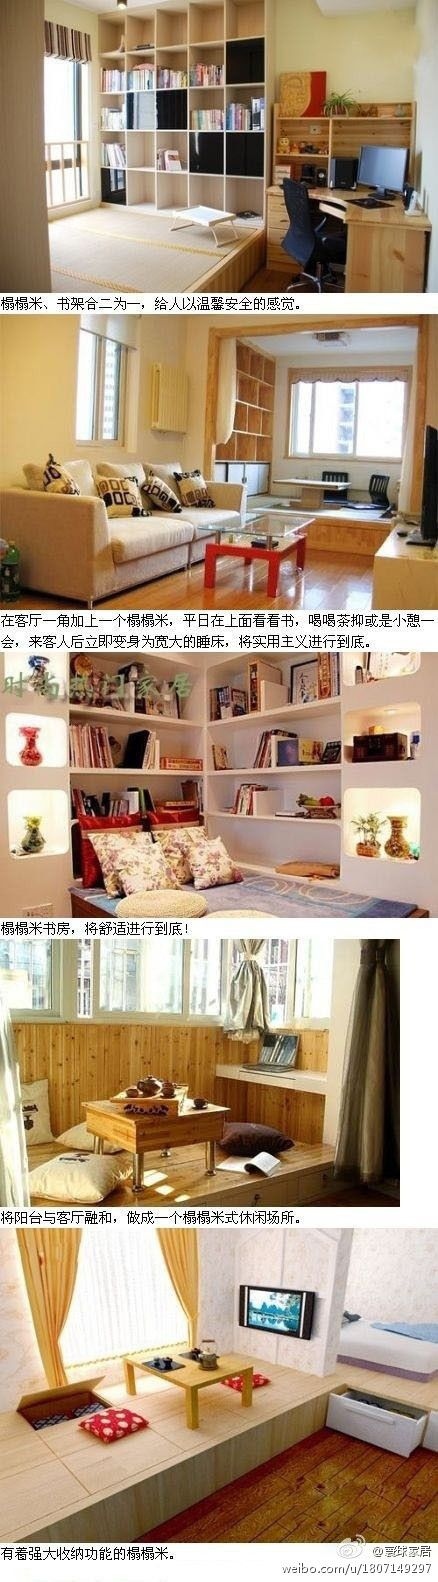 162 best images about decoracion ideas para el hogar on for Ideas para el hogar